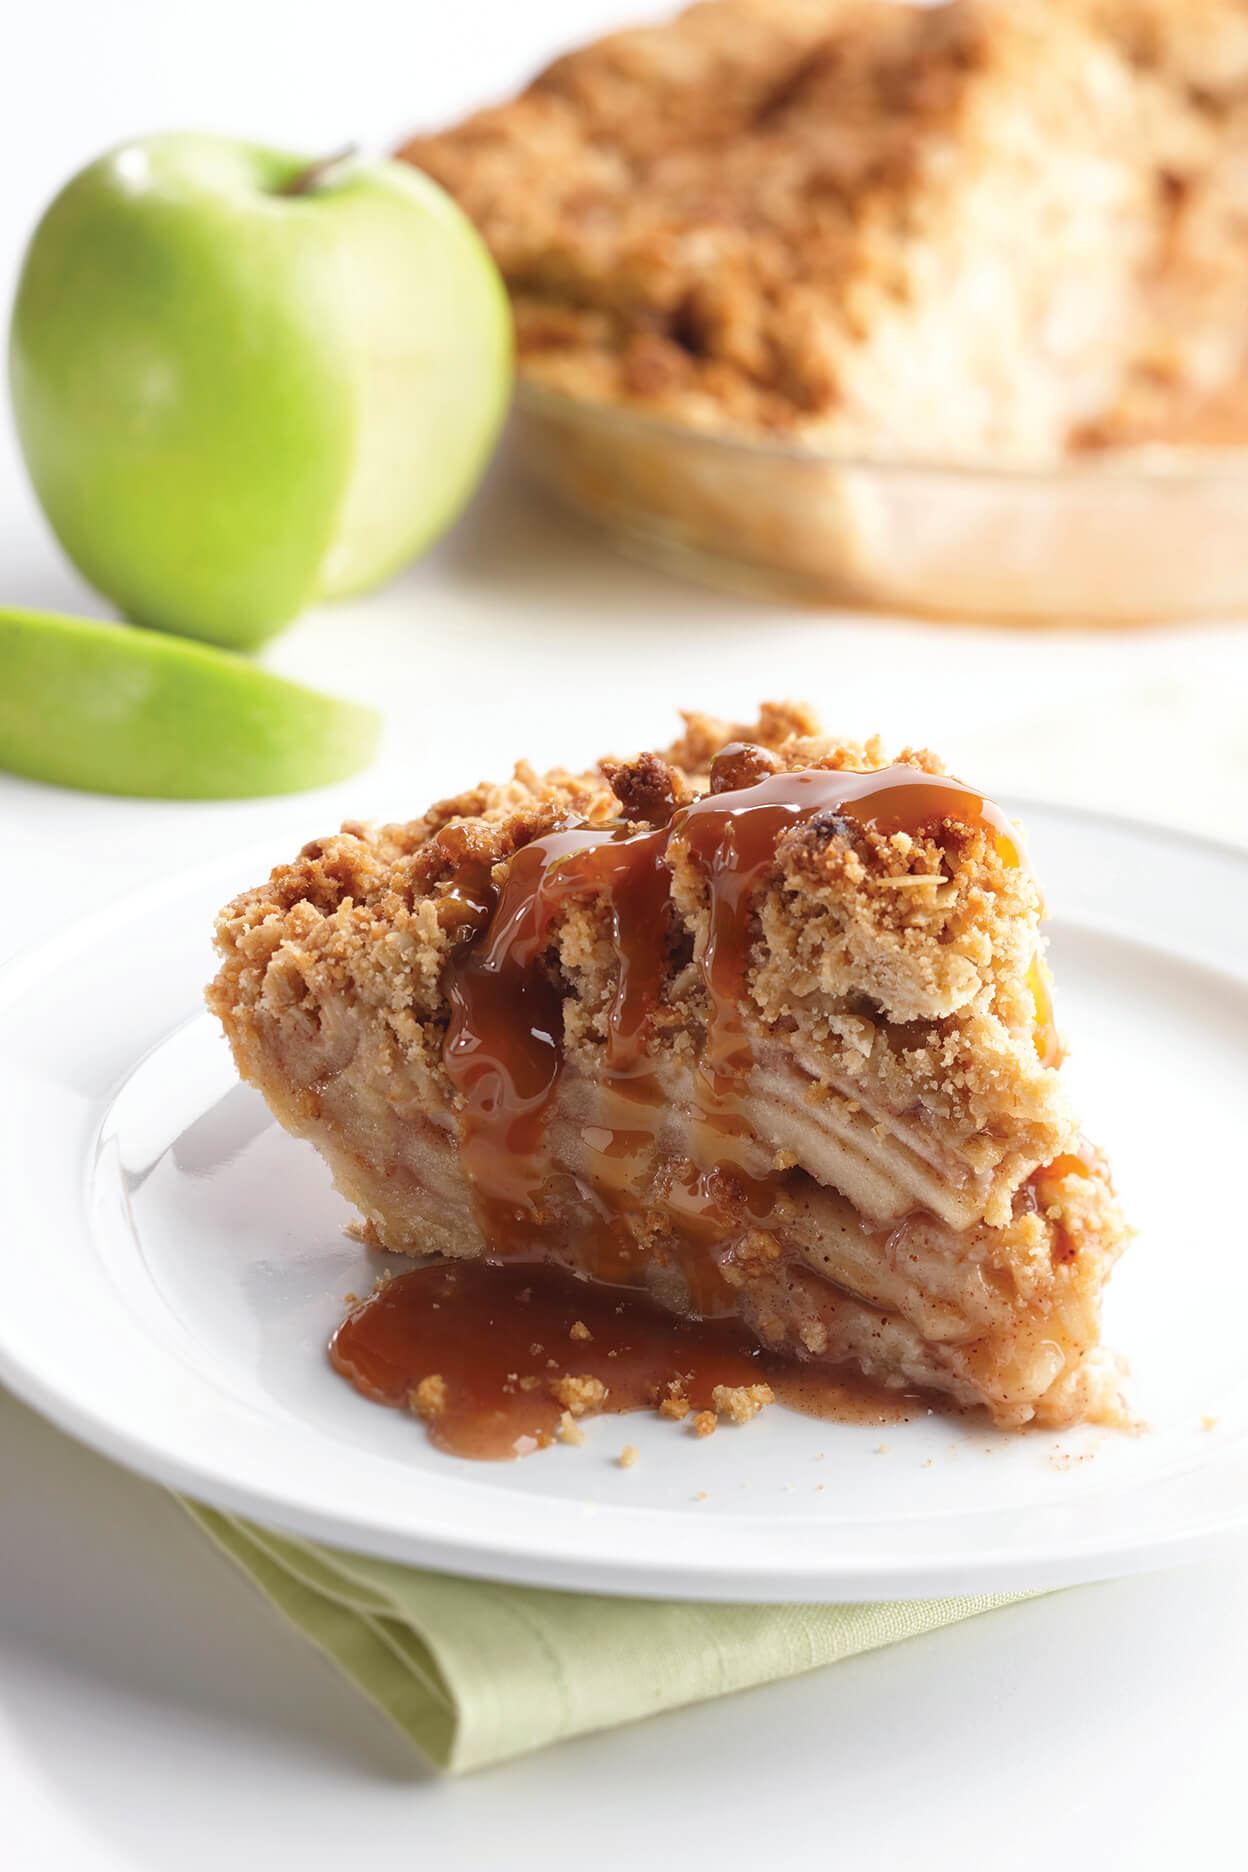 Four-Minute Caramel Apple Pie